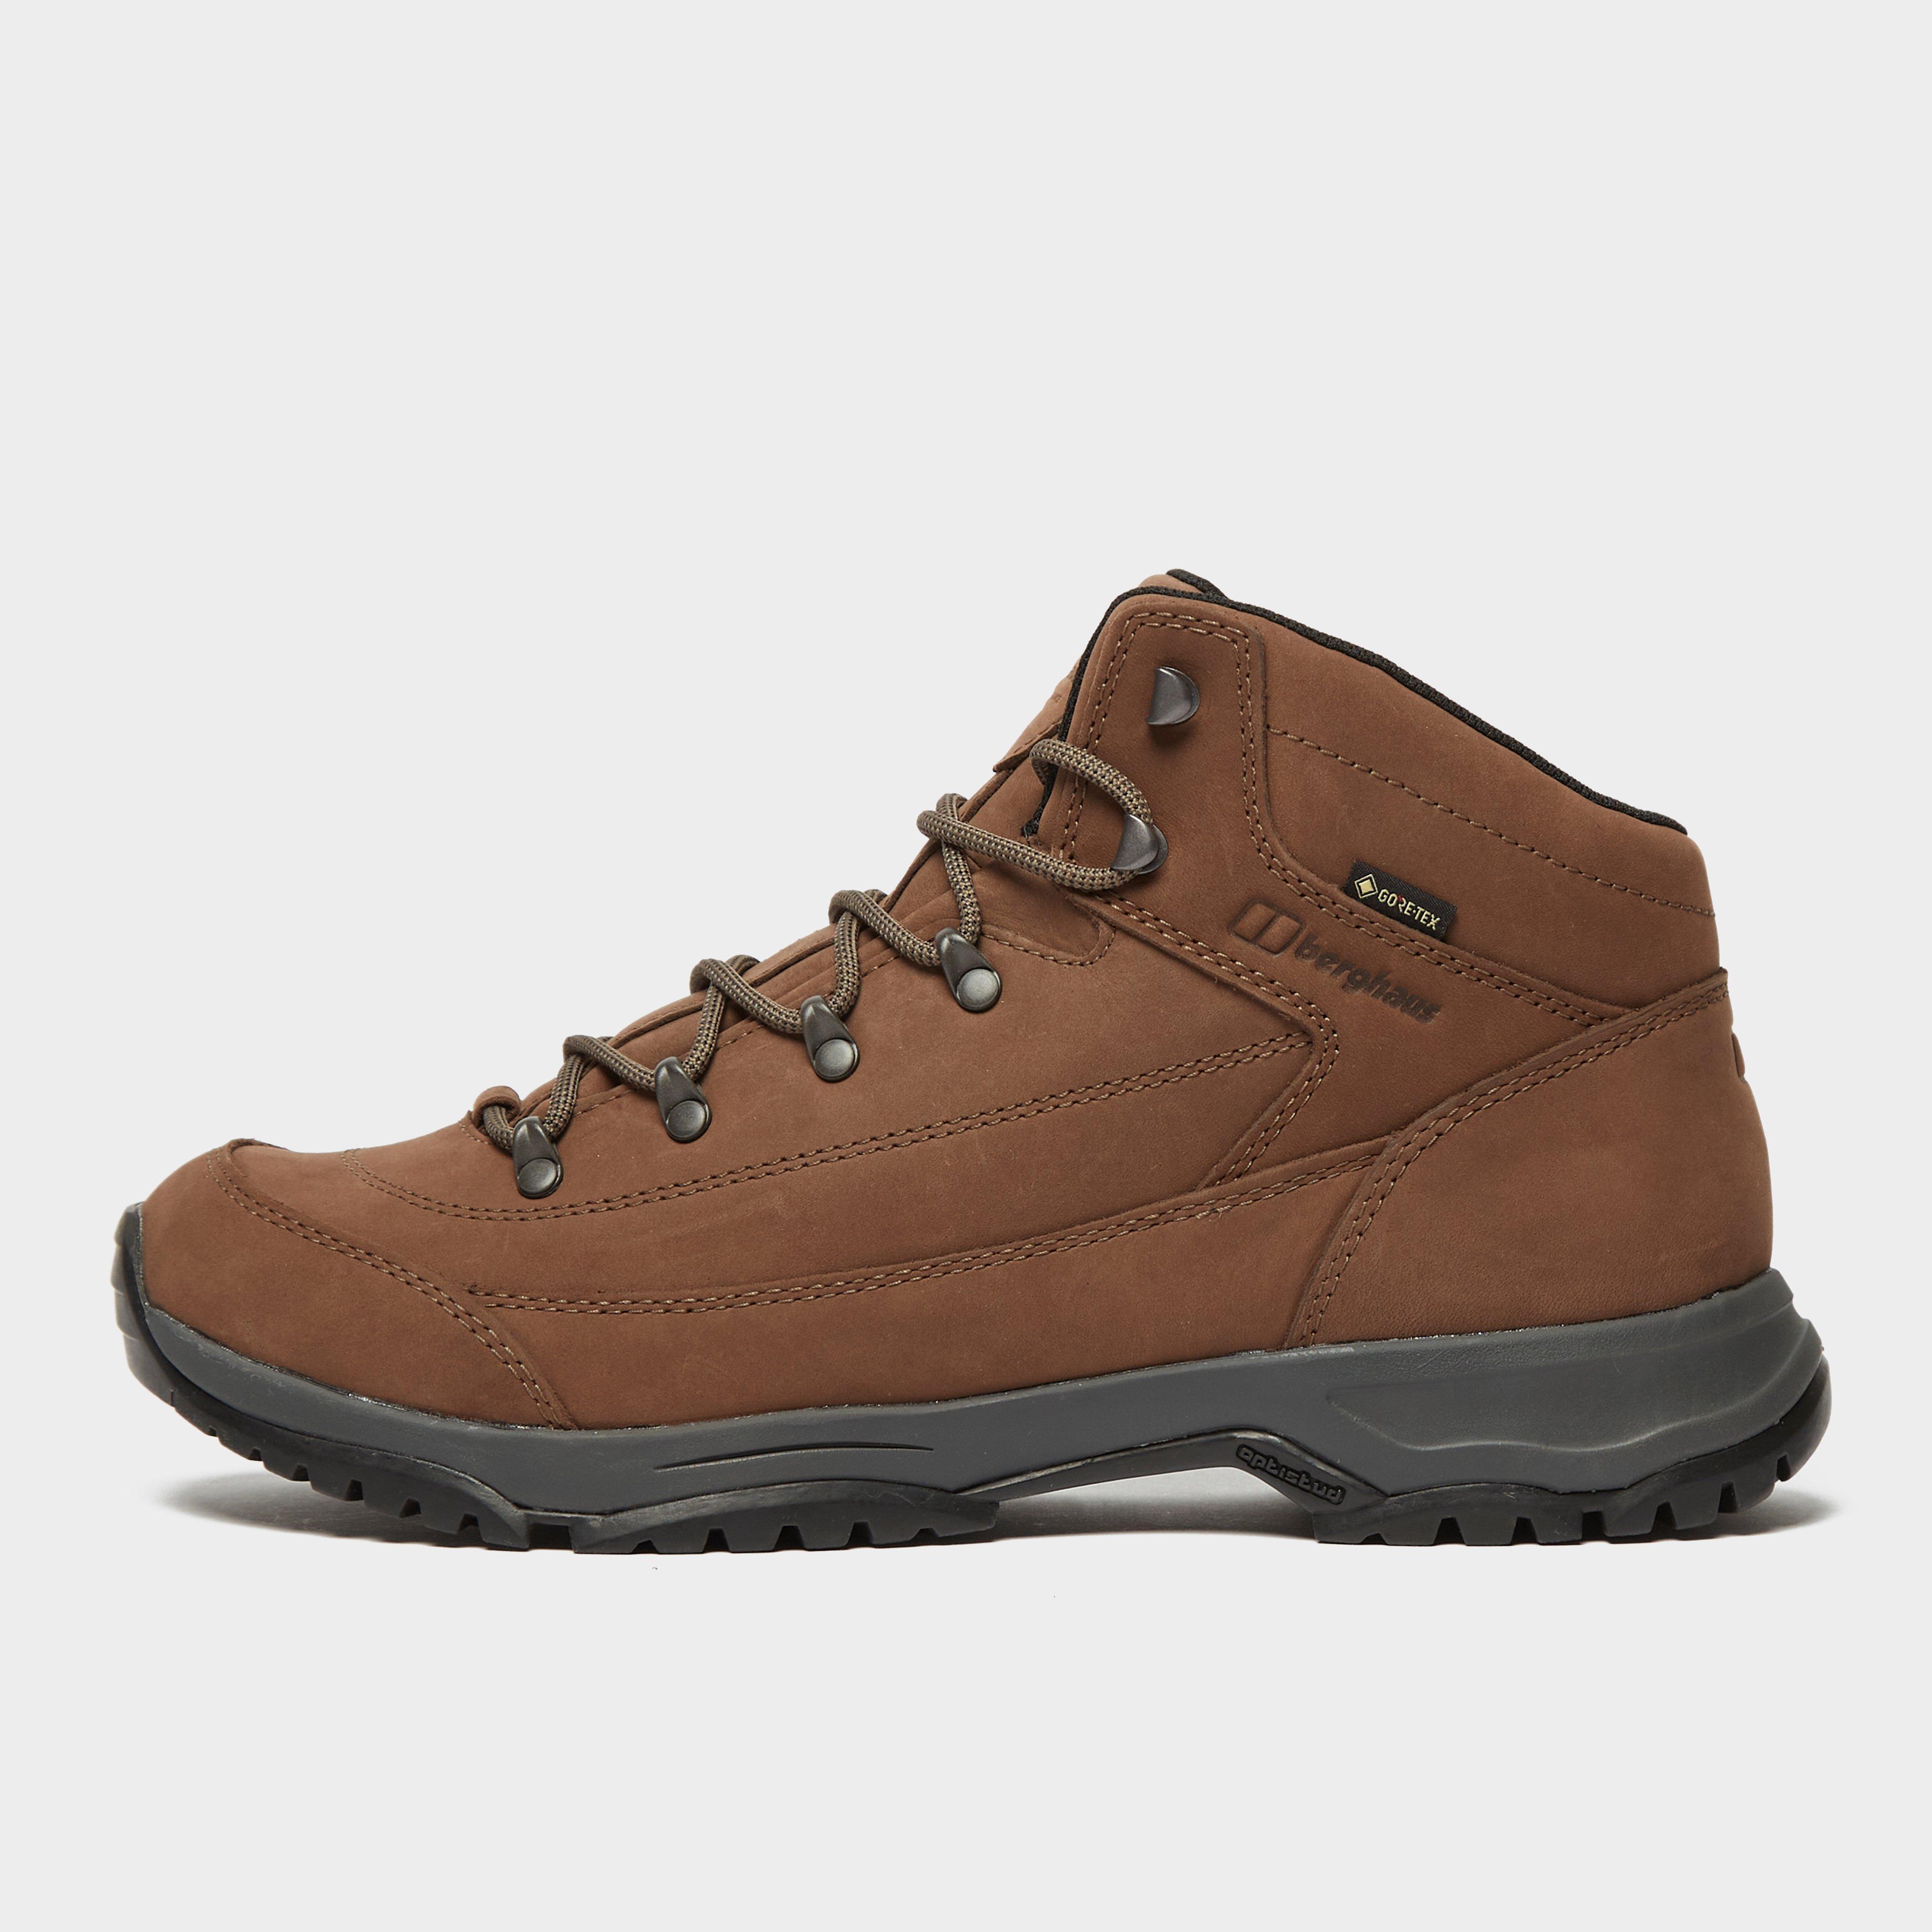 Berghaus Mens Dalemaster Low Gore-tex Walking Shoe - Brown/brn  Brown/brn